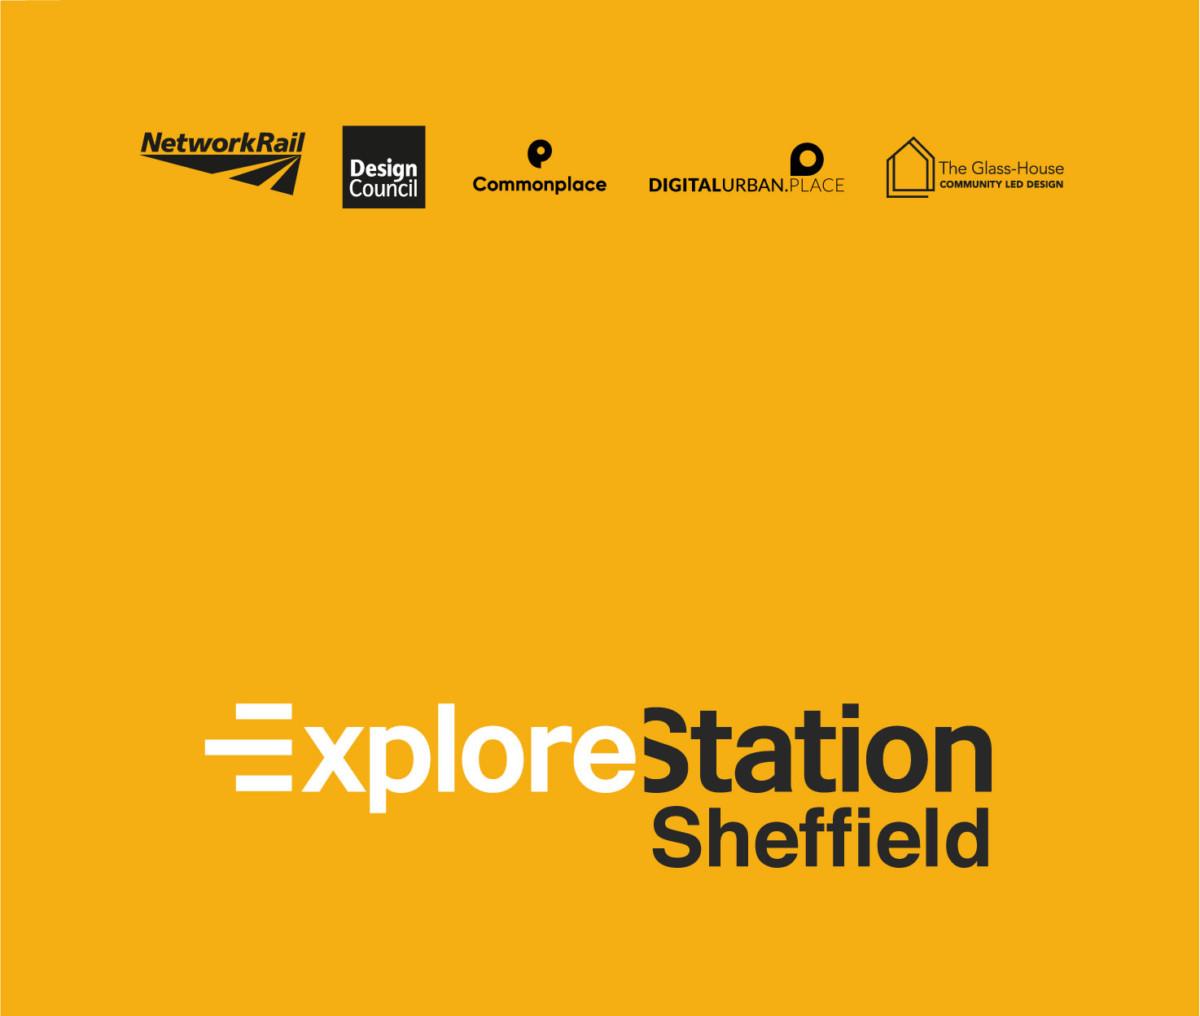 ExploreStation: Sheffield Exhibition and Workshop